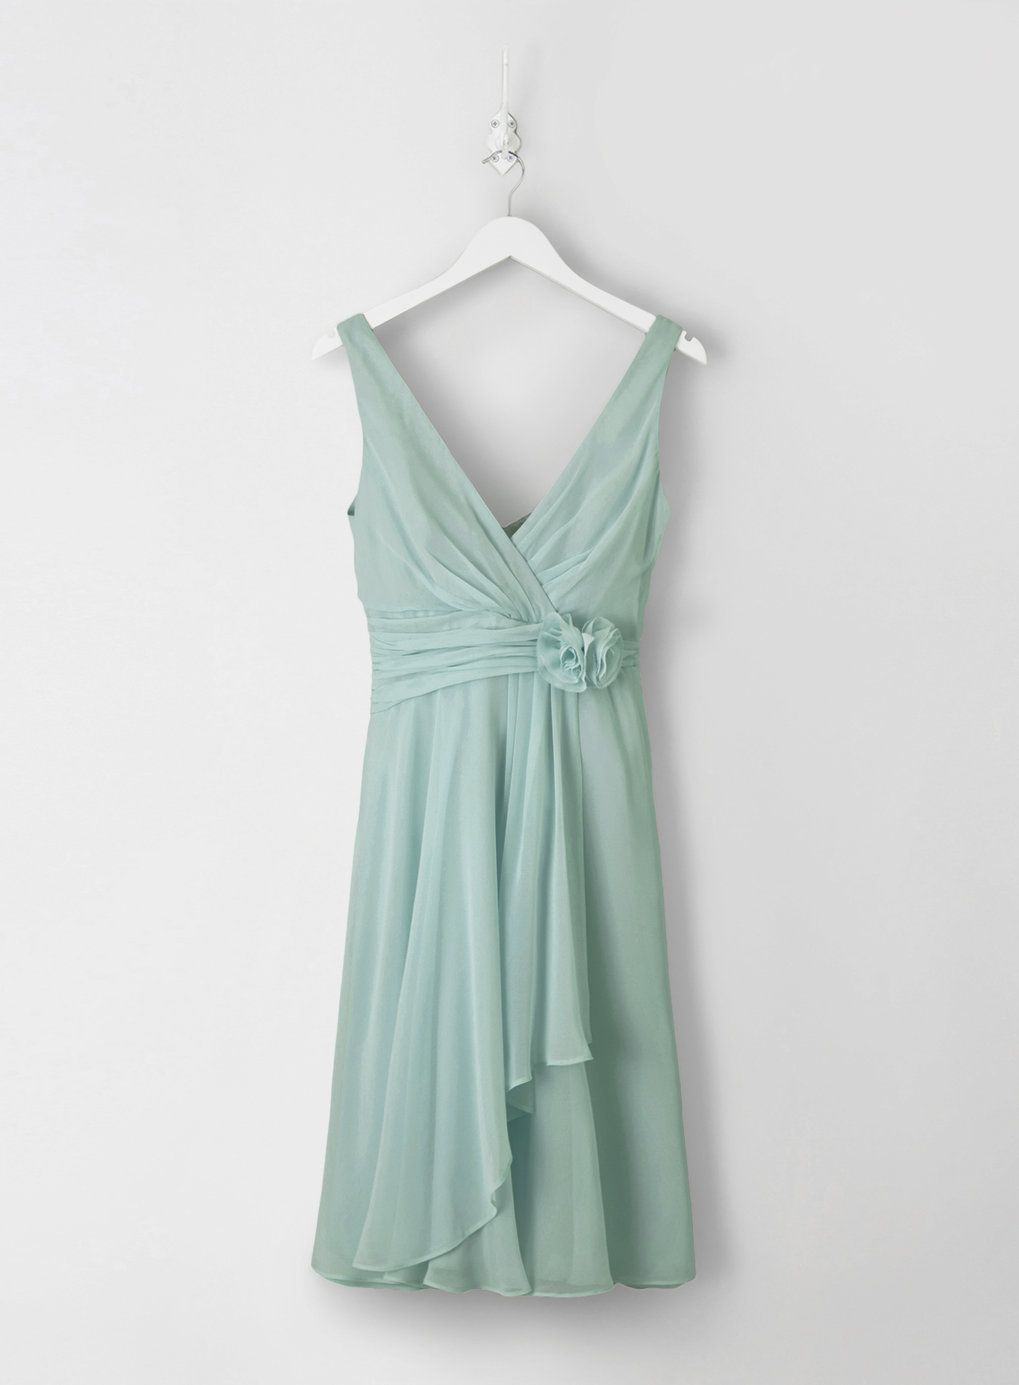 Dark Mint Amber Short Bridesmaid Dress - BHS | Wedding inspiration ...